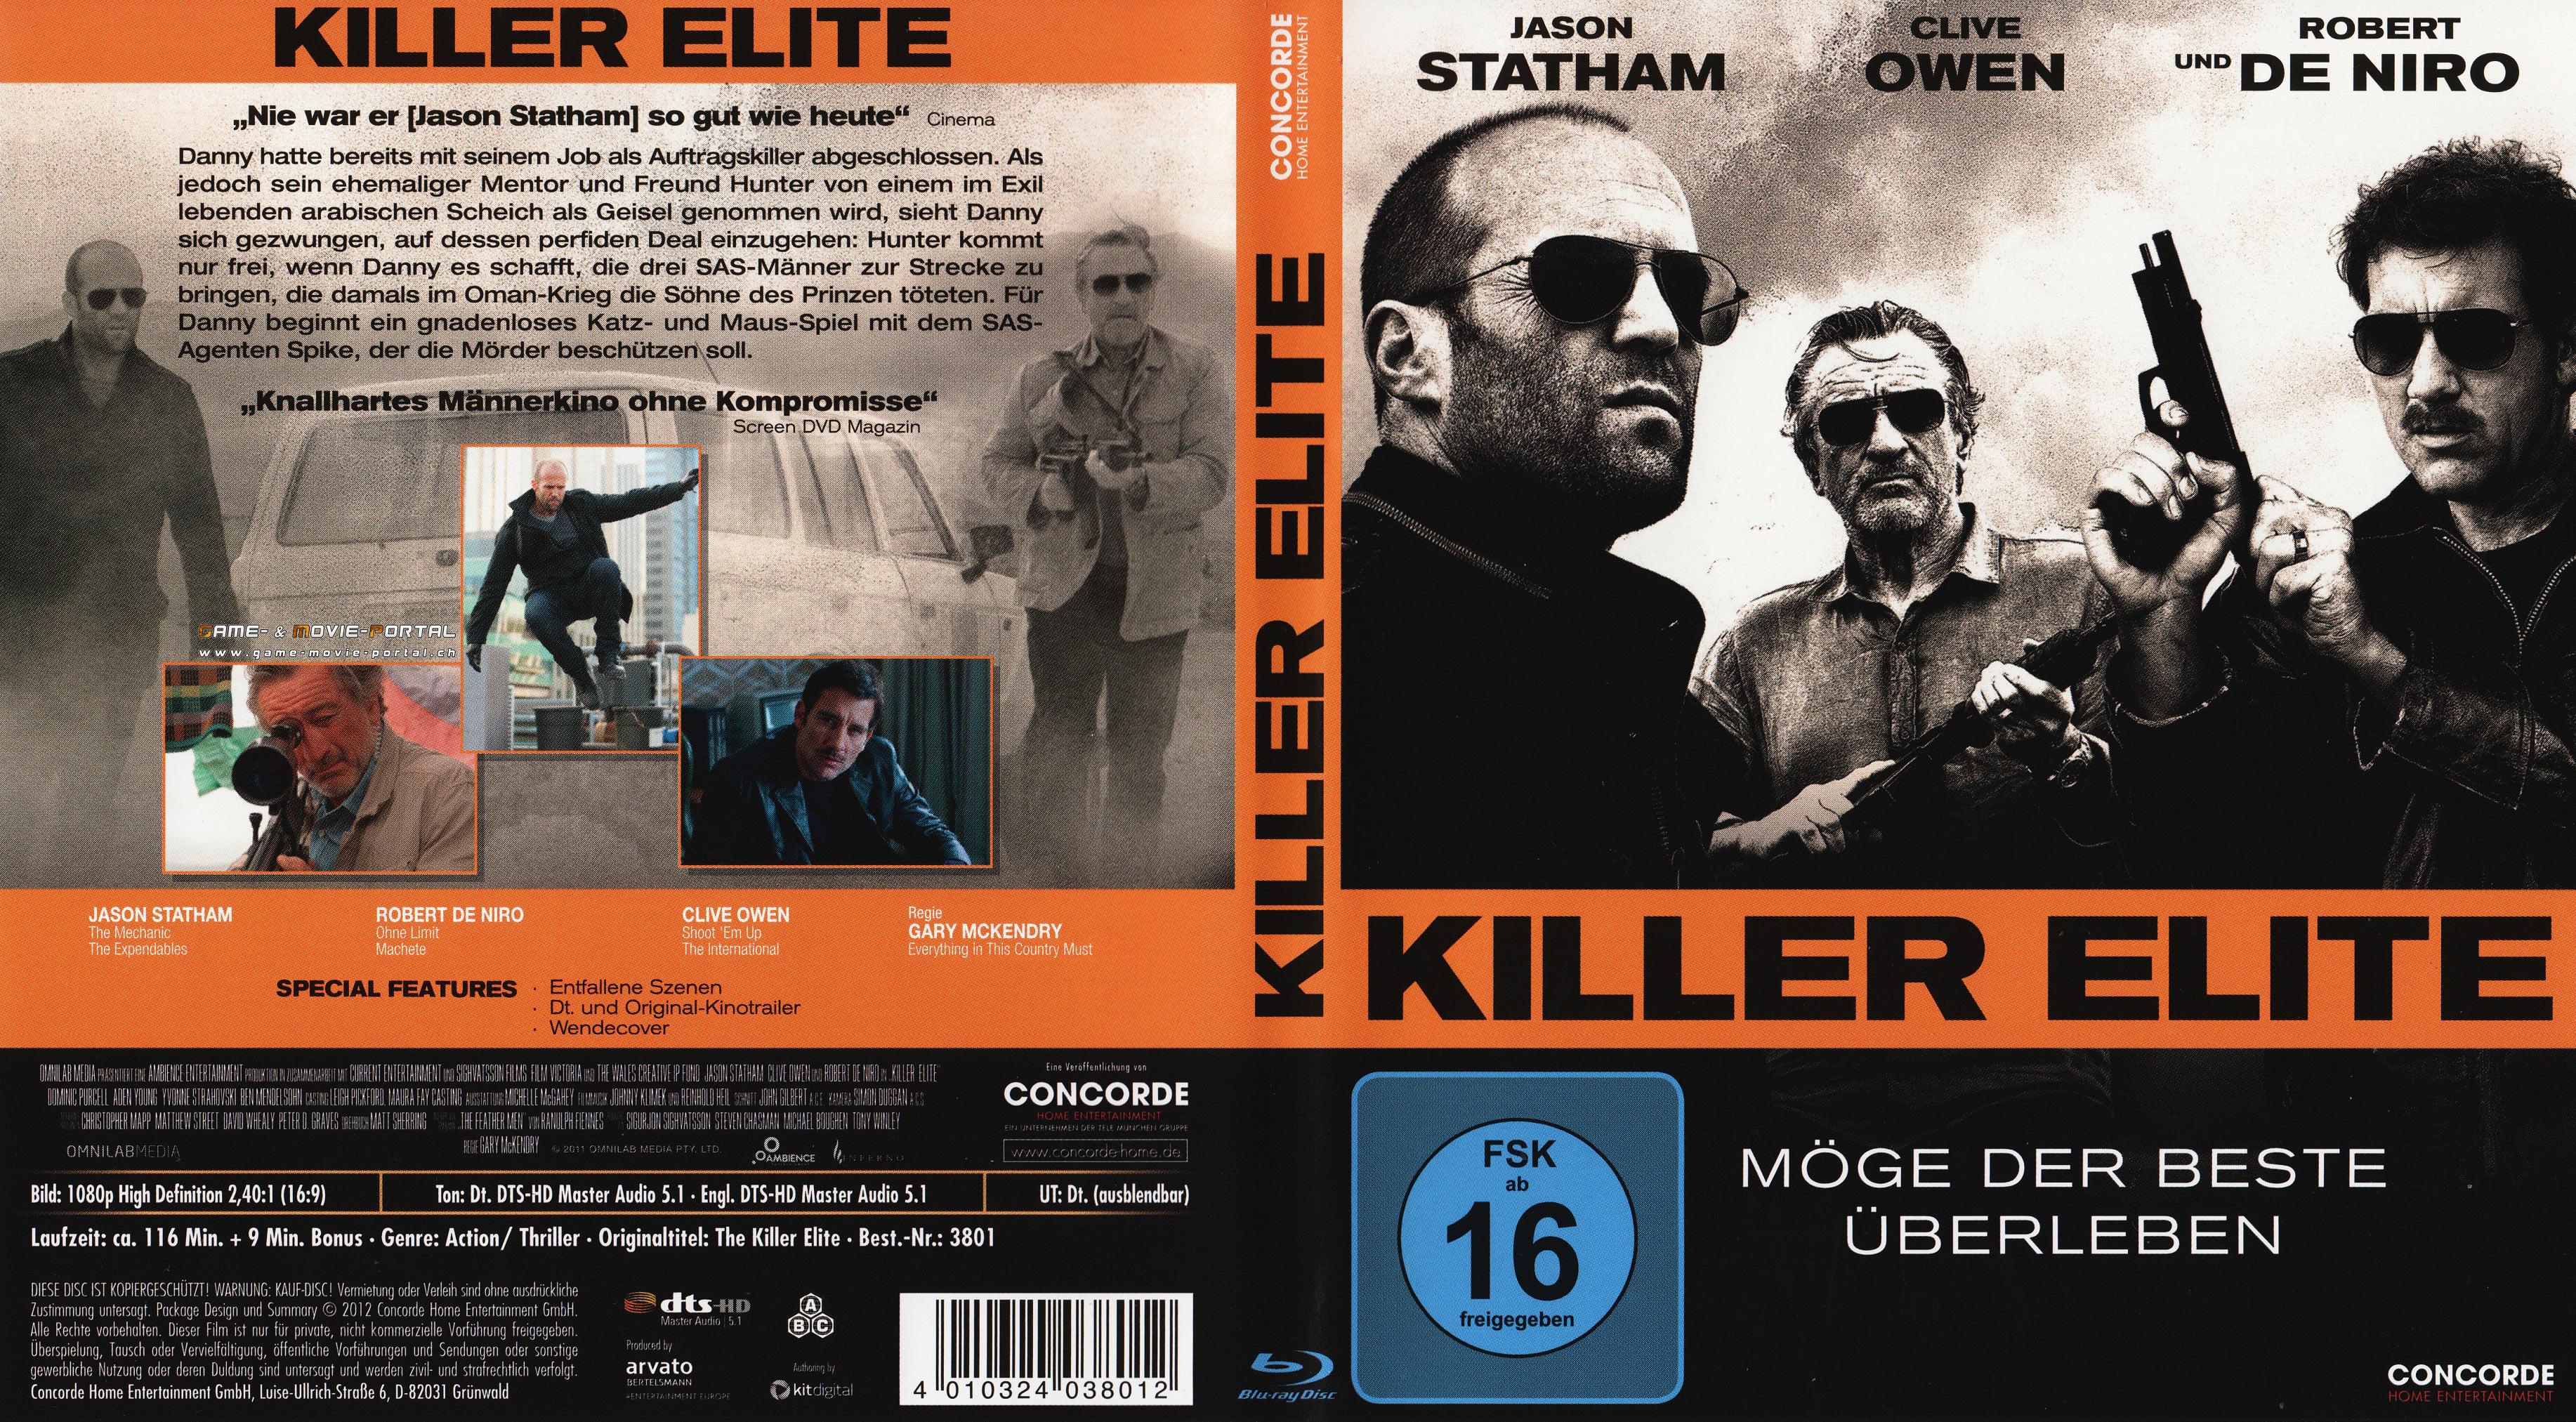 GMP Killer Elite Cover Packshot Poster In High Quality